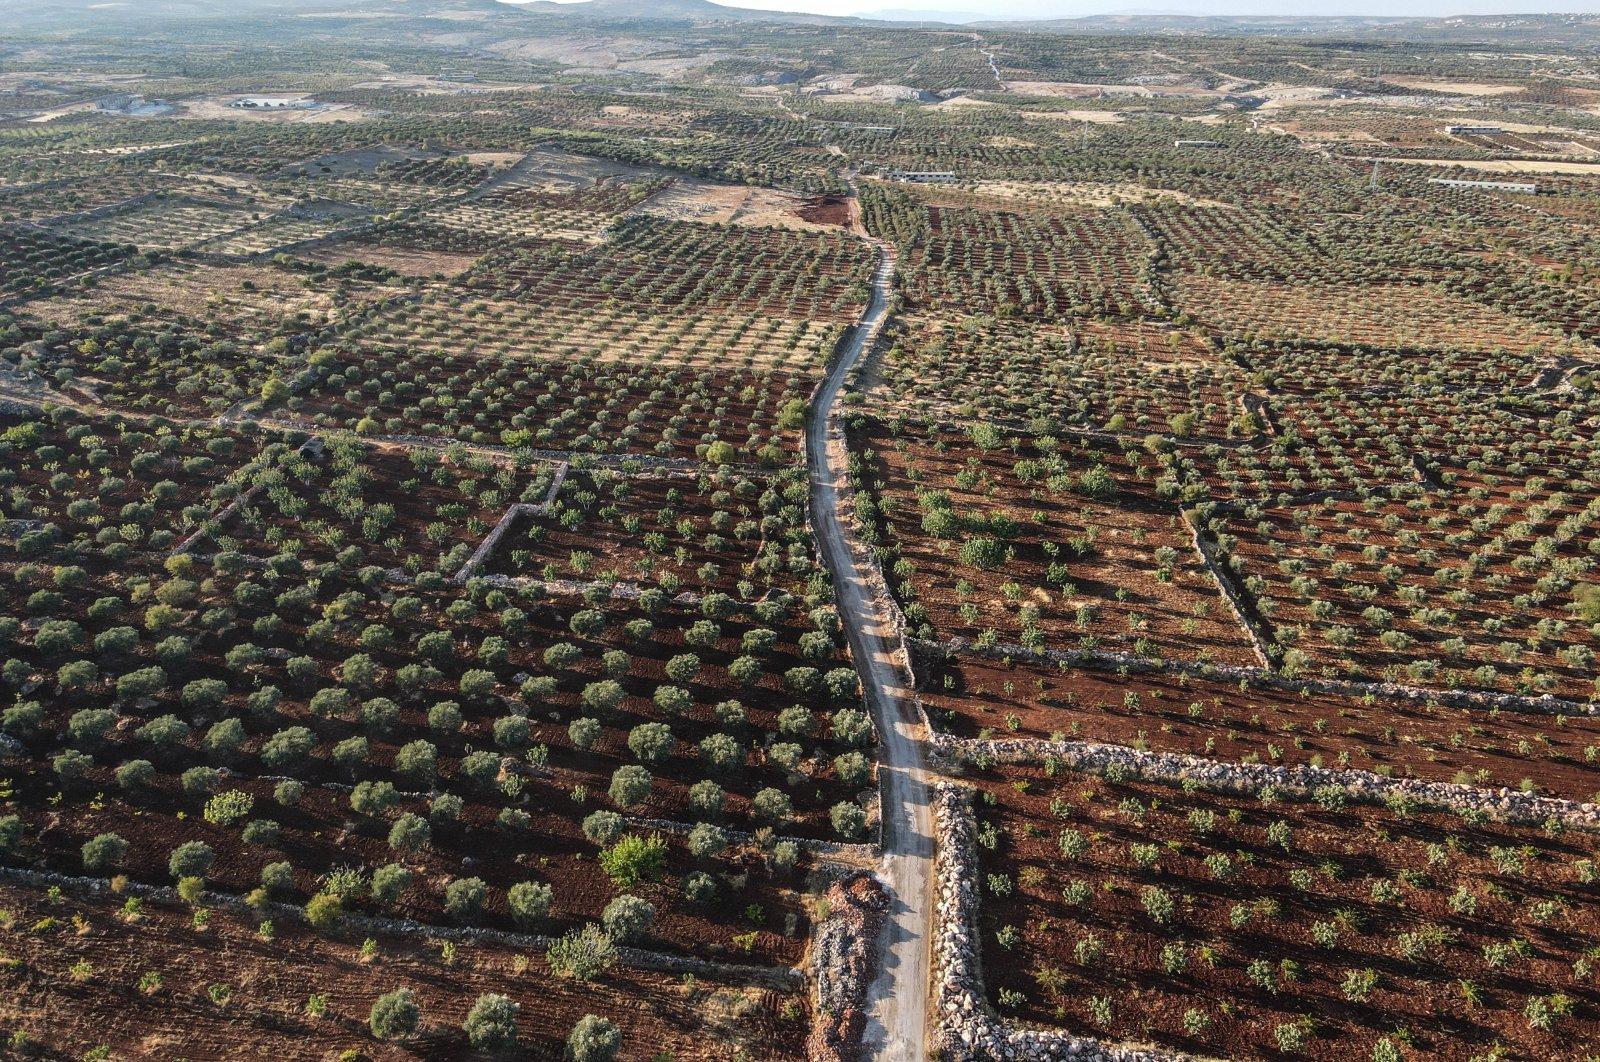 Fig trees are seen in the Jabal al-Zawiya region of Idlib governorate, northwestern Syria, Aug. 24, 2021. (AA Photo)